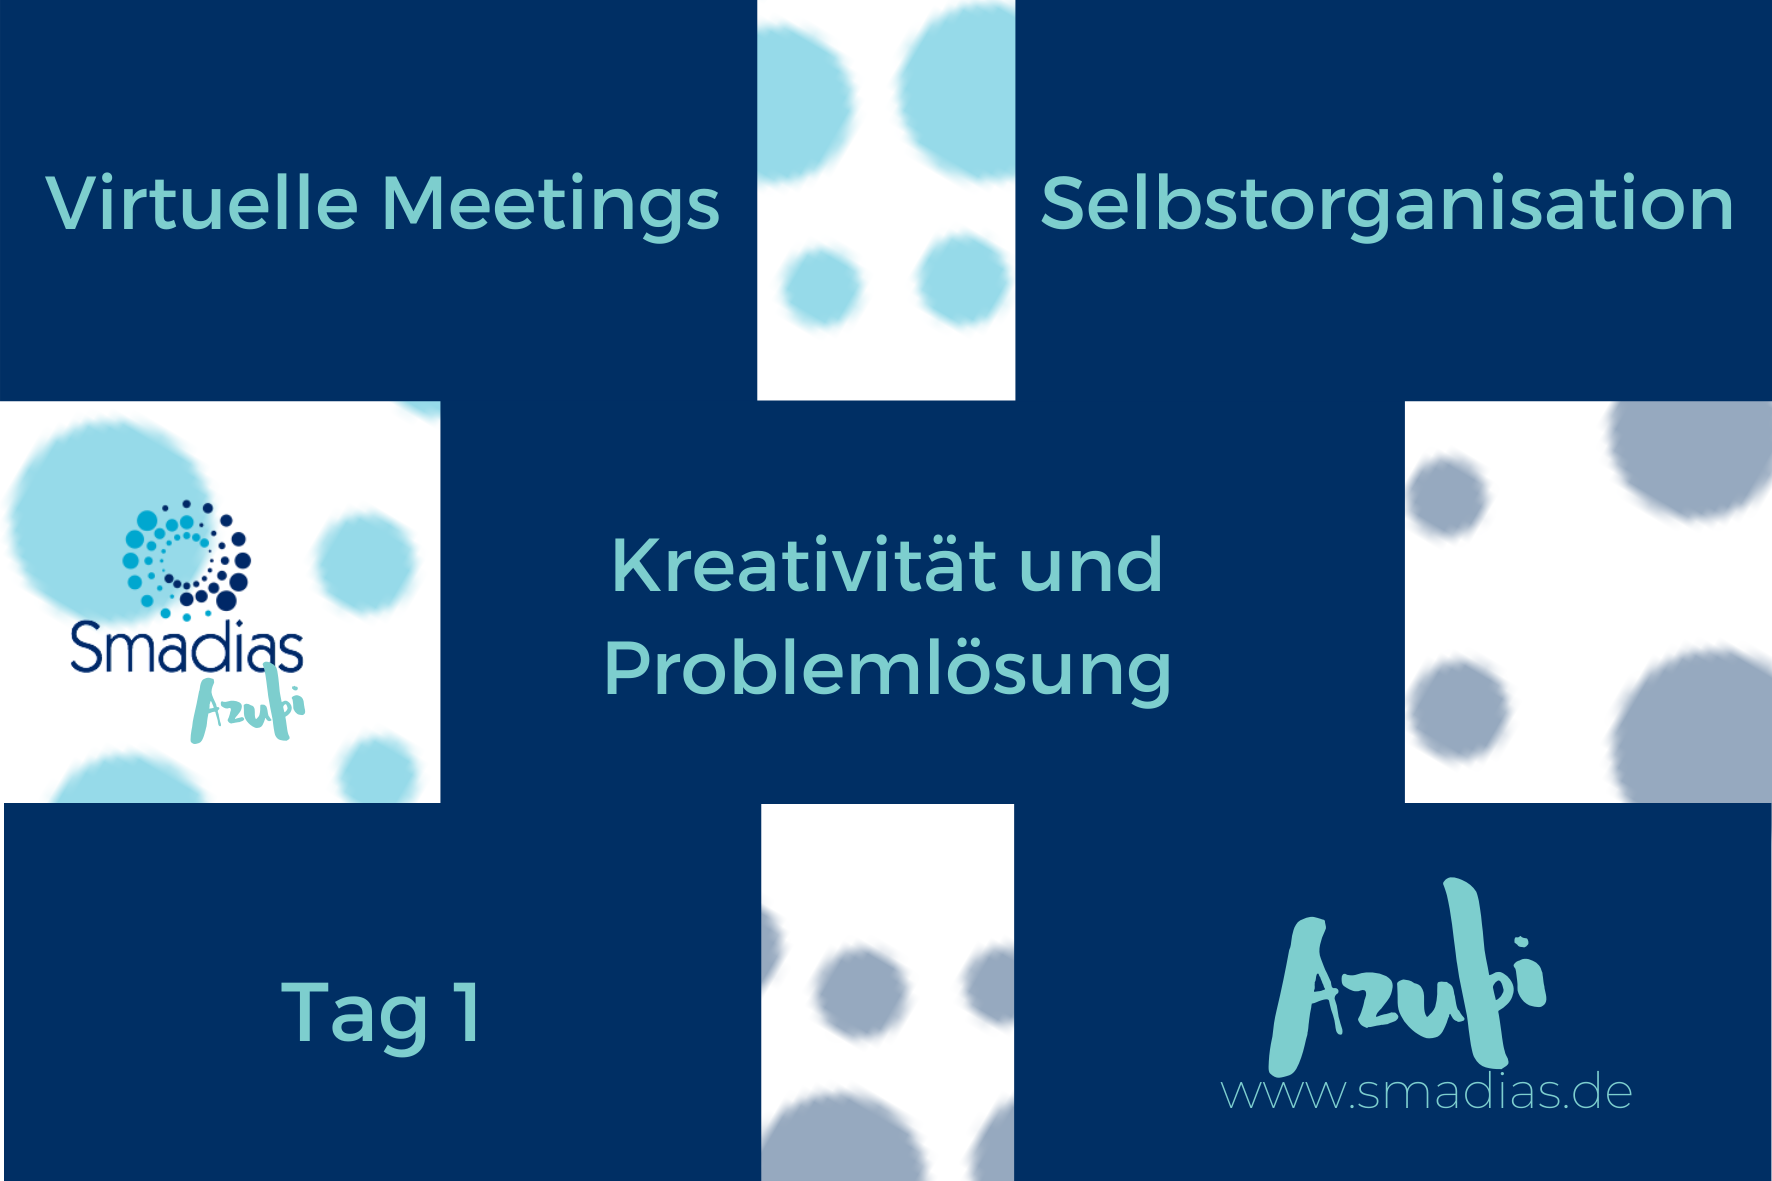 Webinar: Azubi-Webinar-Reihe Tag 1